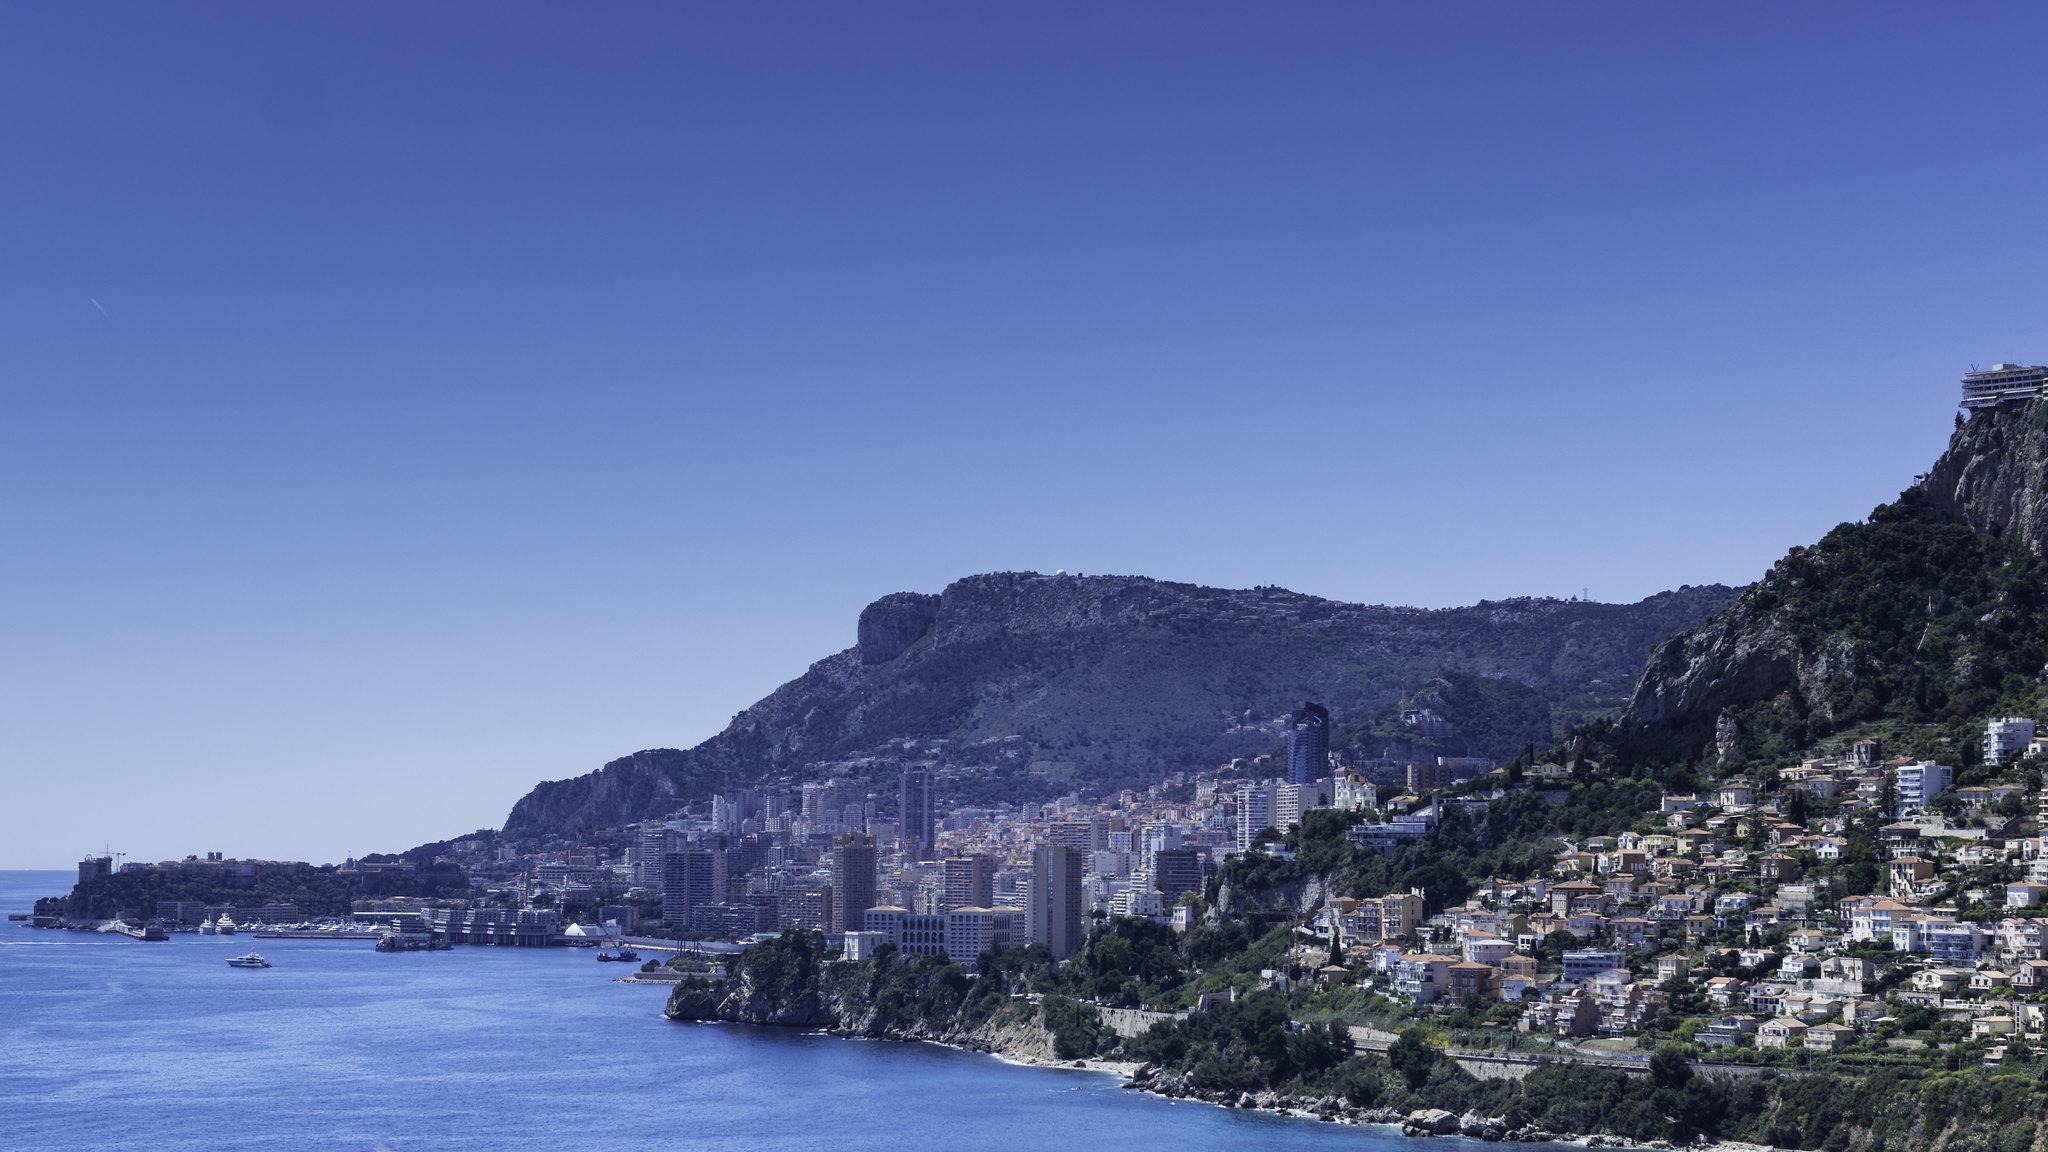 Roquebrune Cap Martin cosa vedere